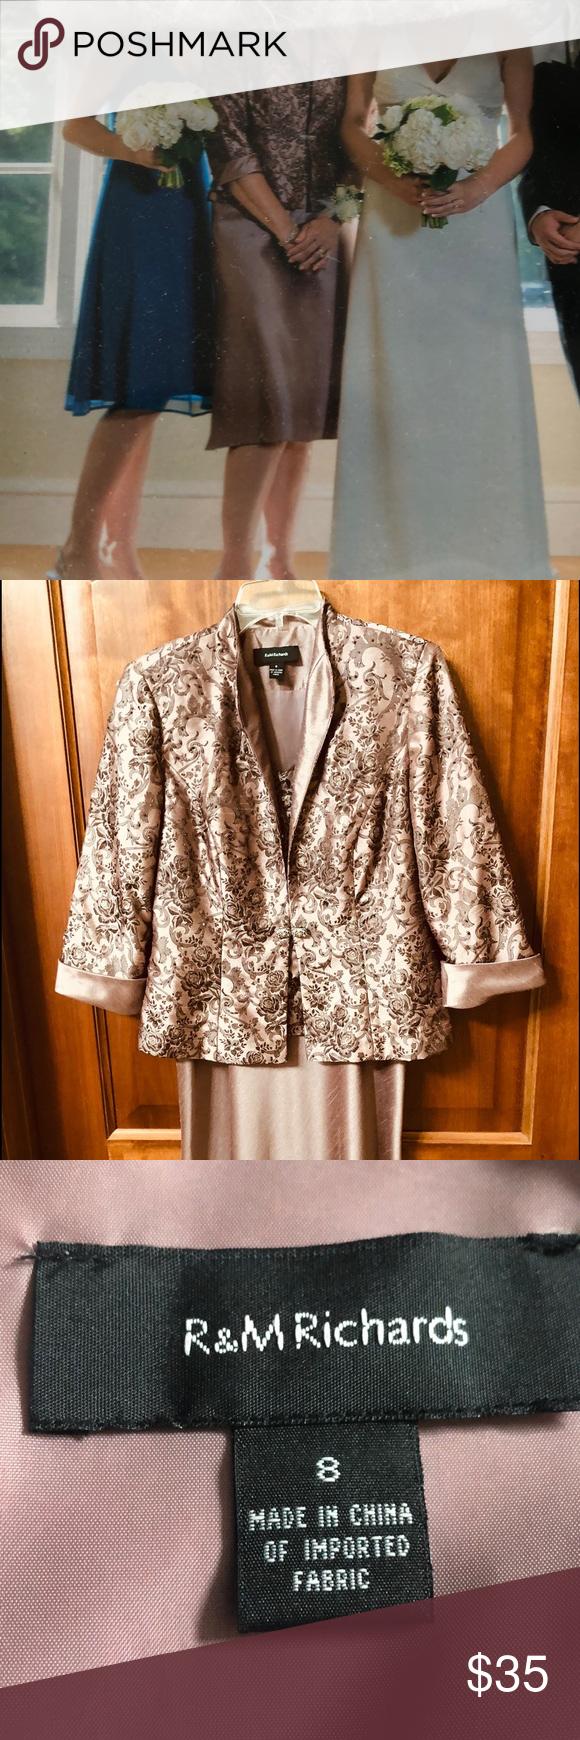 4d1eabbadf6 I just added this listing on Poshmark  Mother of the Bride Dress with  Jacket Rose size 8.  shopmycloset  poshmark  fashion  shopping  style   forsale ...